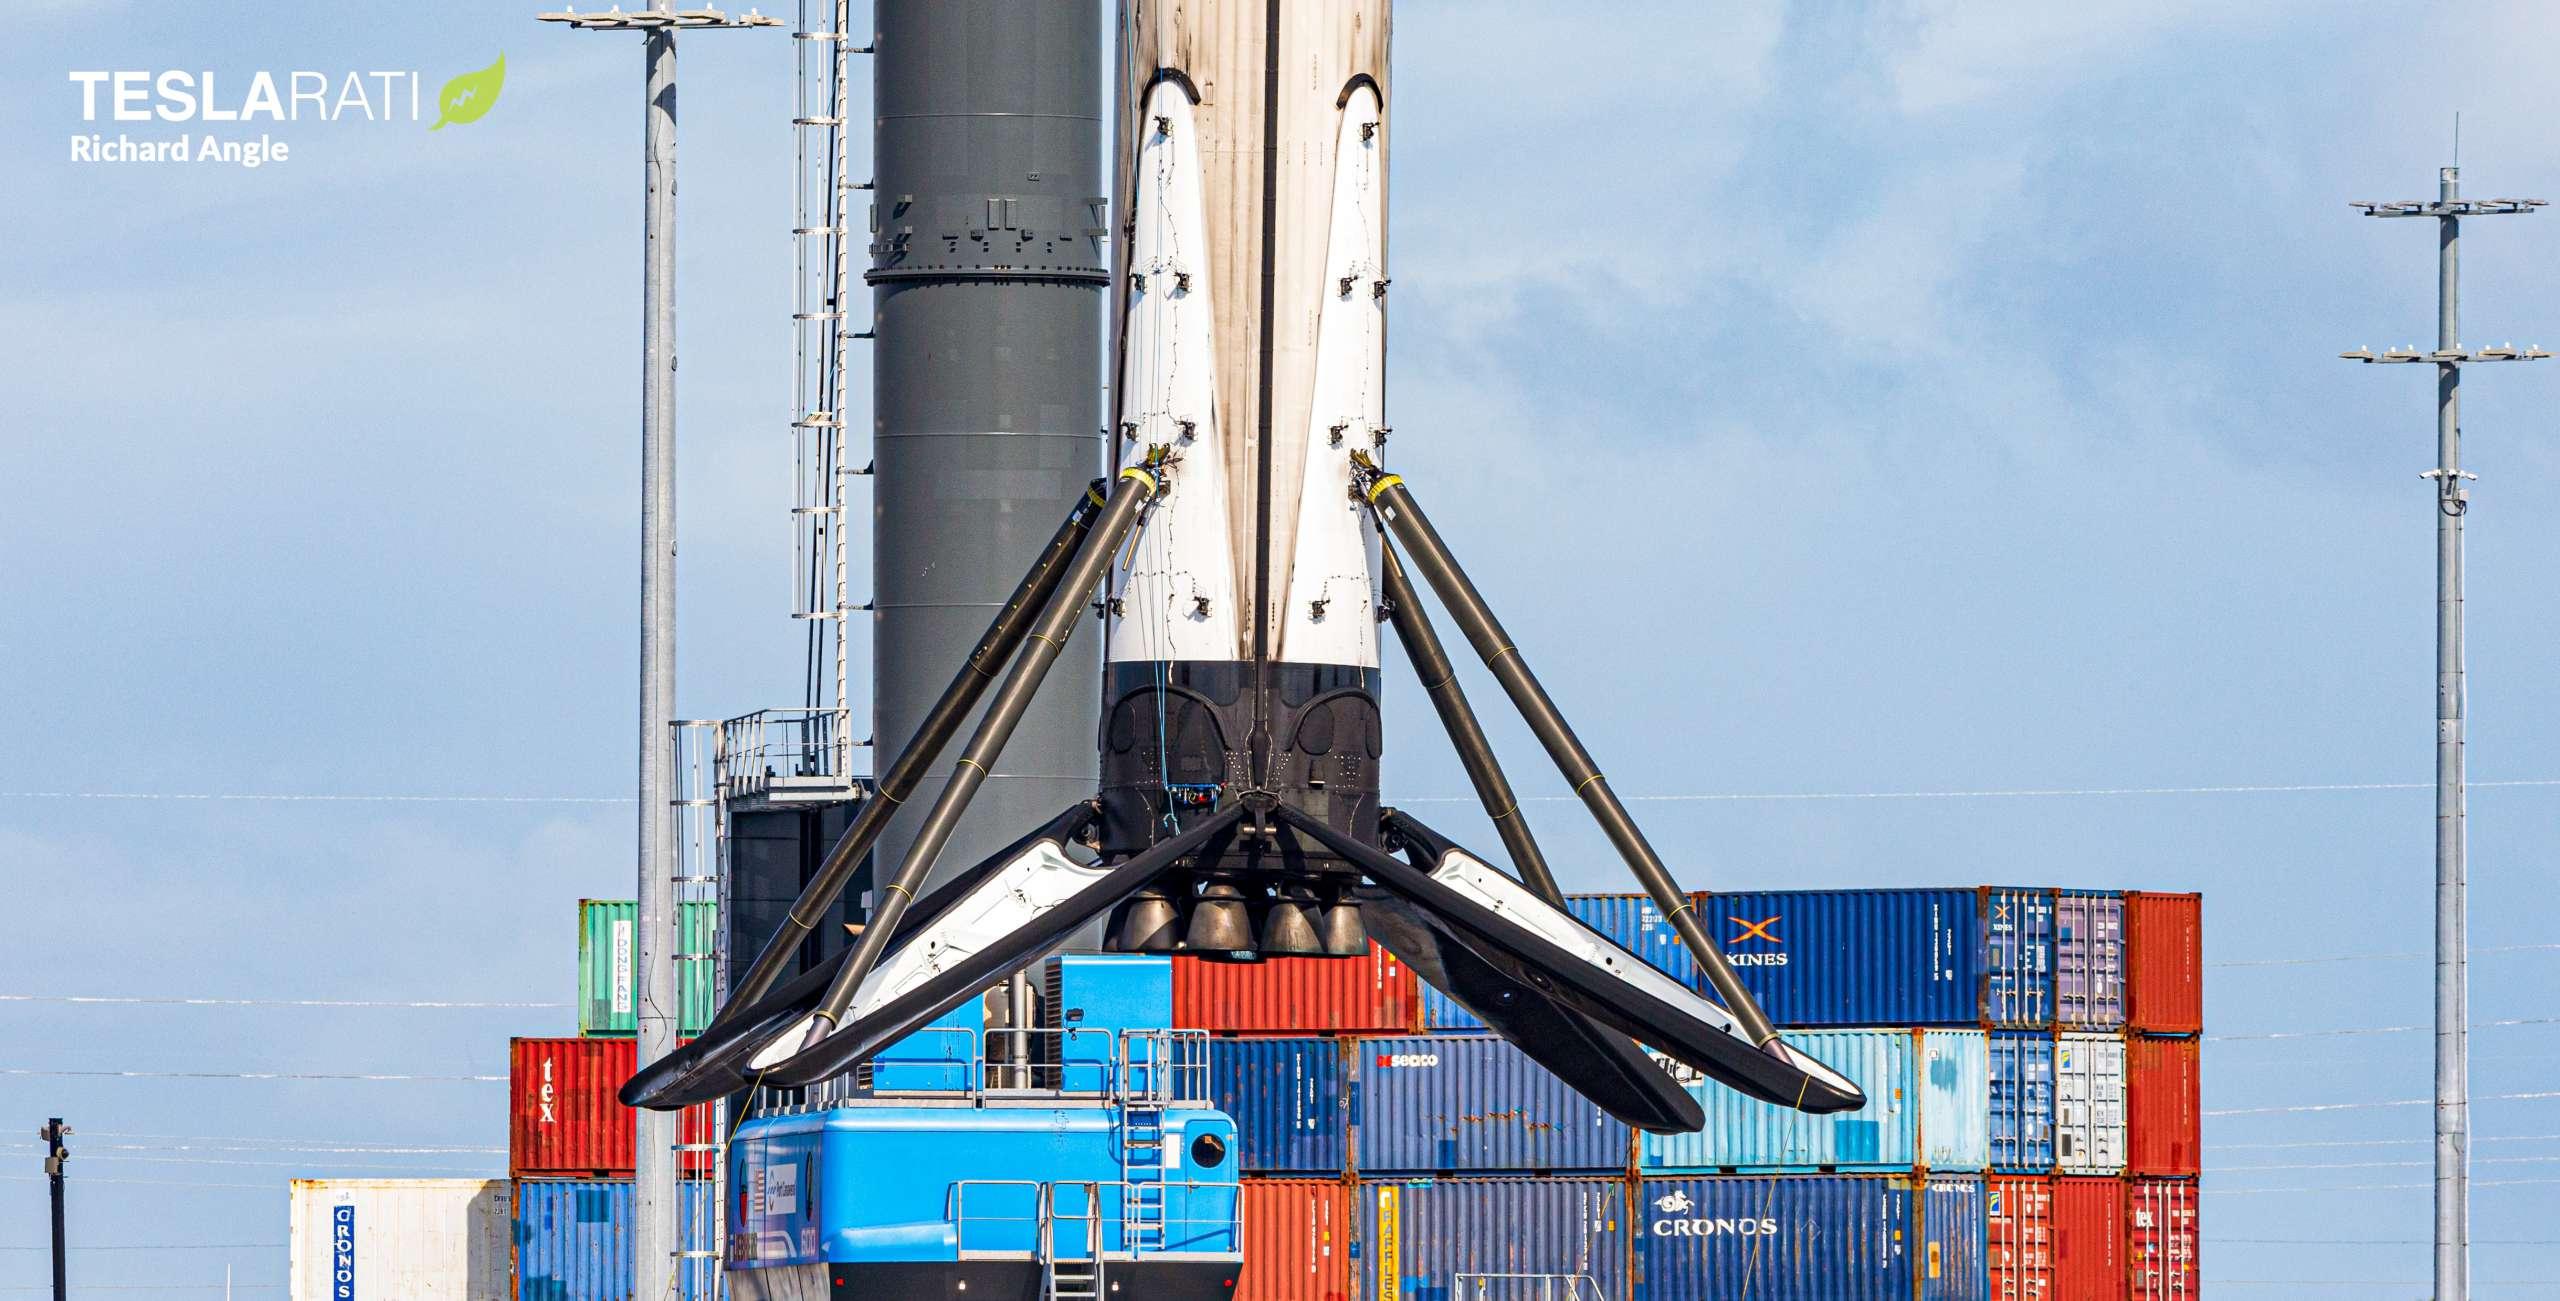 Crew-1 Falcon 9 B1061 JRTI return 112020 (Richard Angle) lift 3 crop (c)